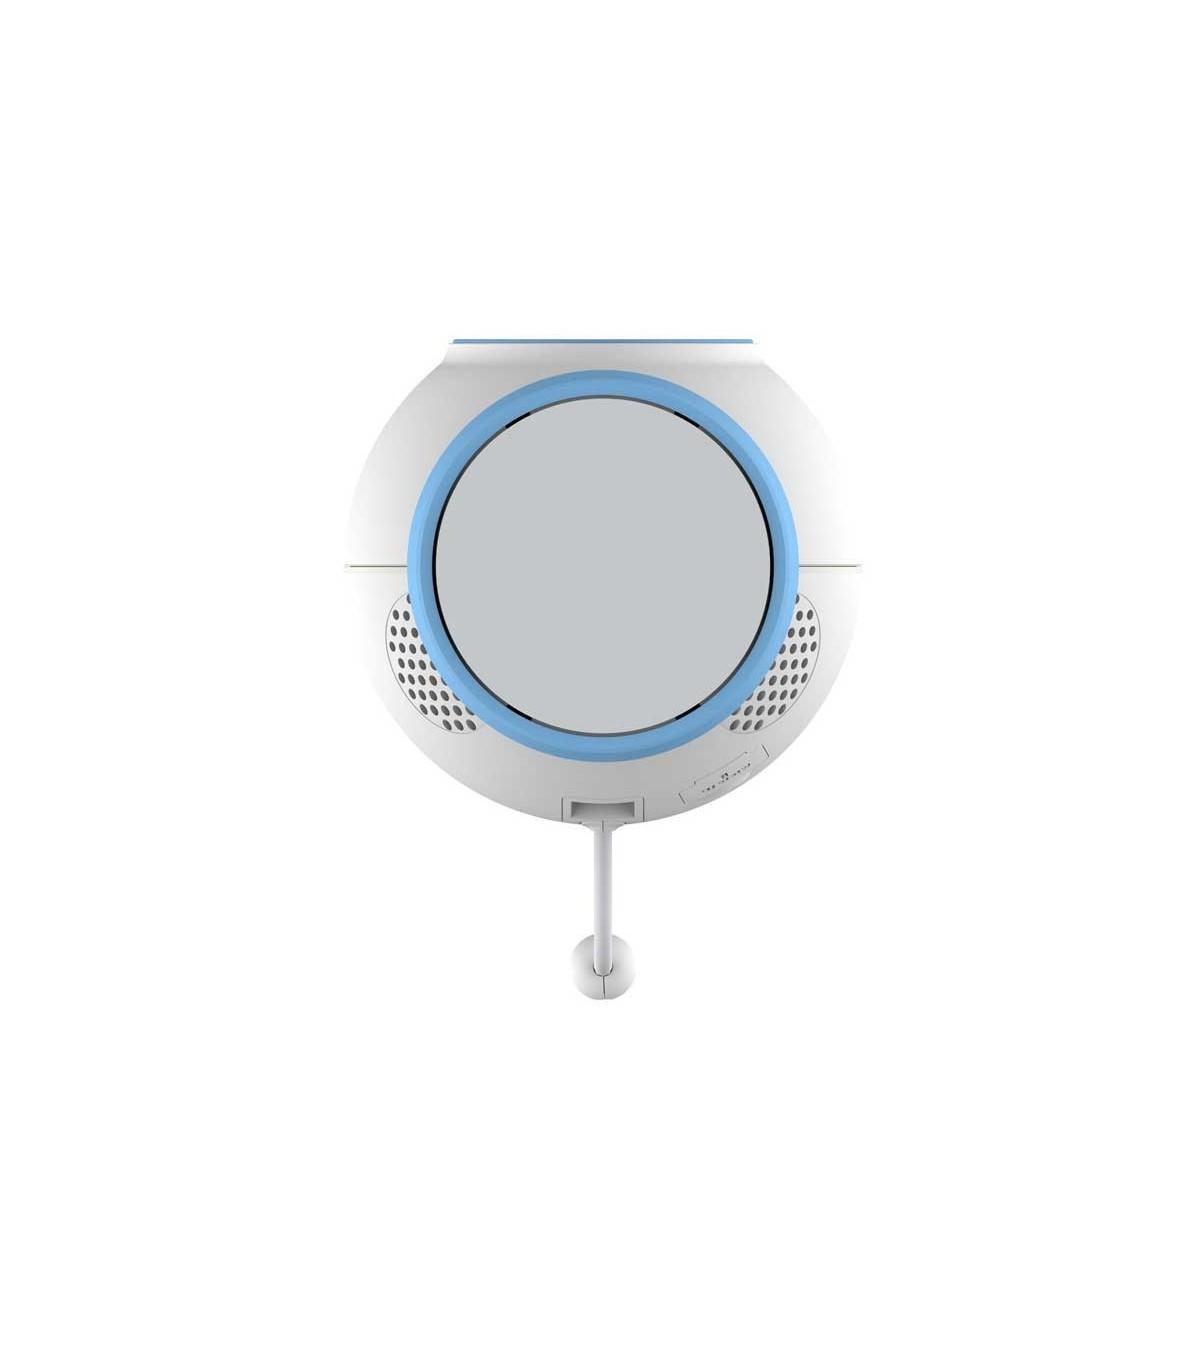 دوربین مراقبت از کودک D-Link DCS-825L Wi-Fi Day/Night HD with Remote Monitoring